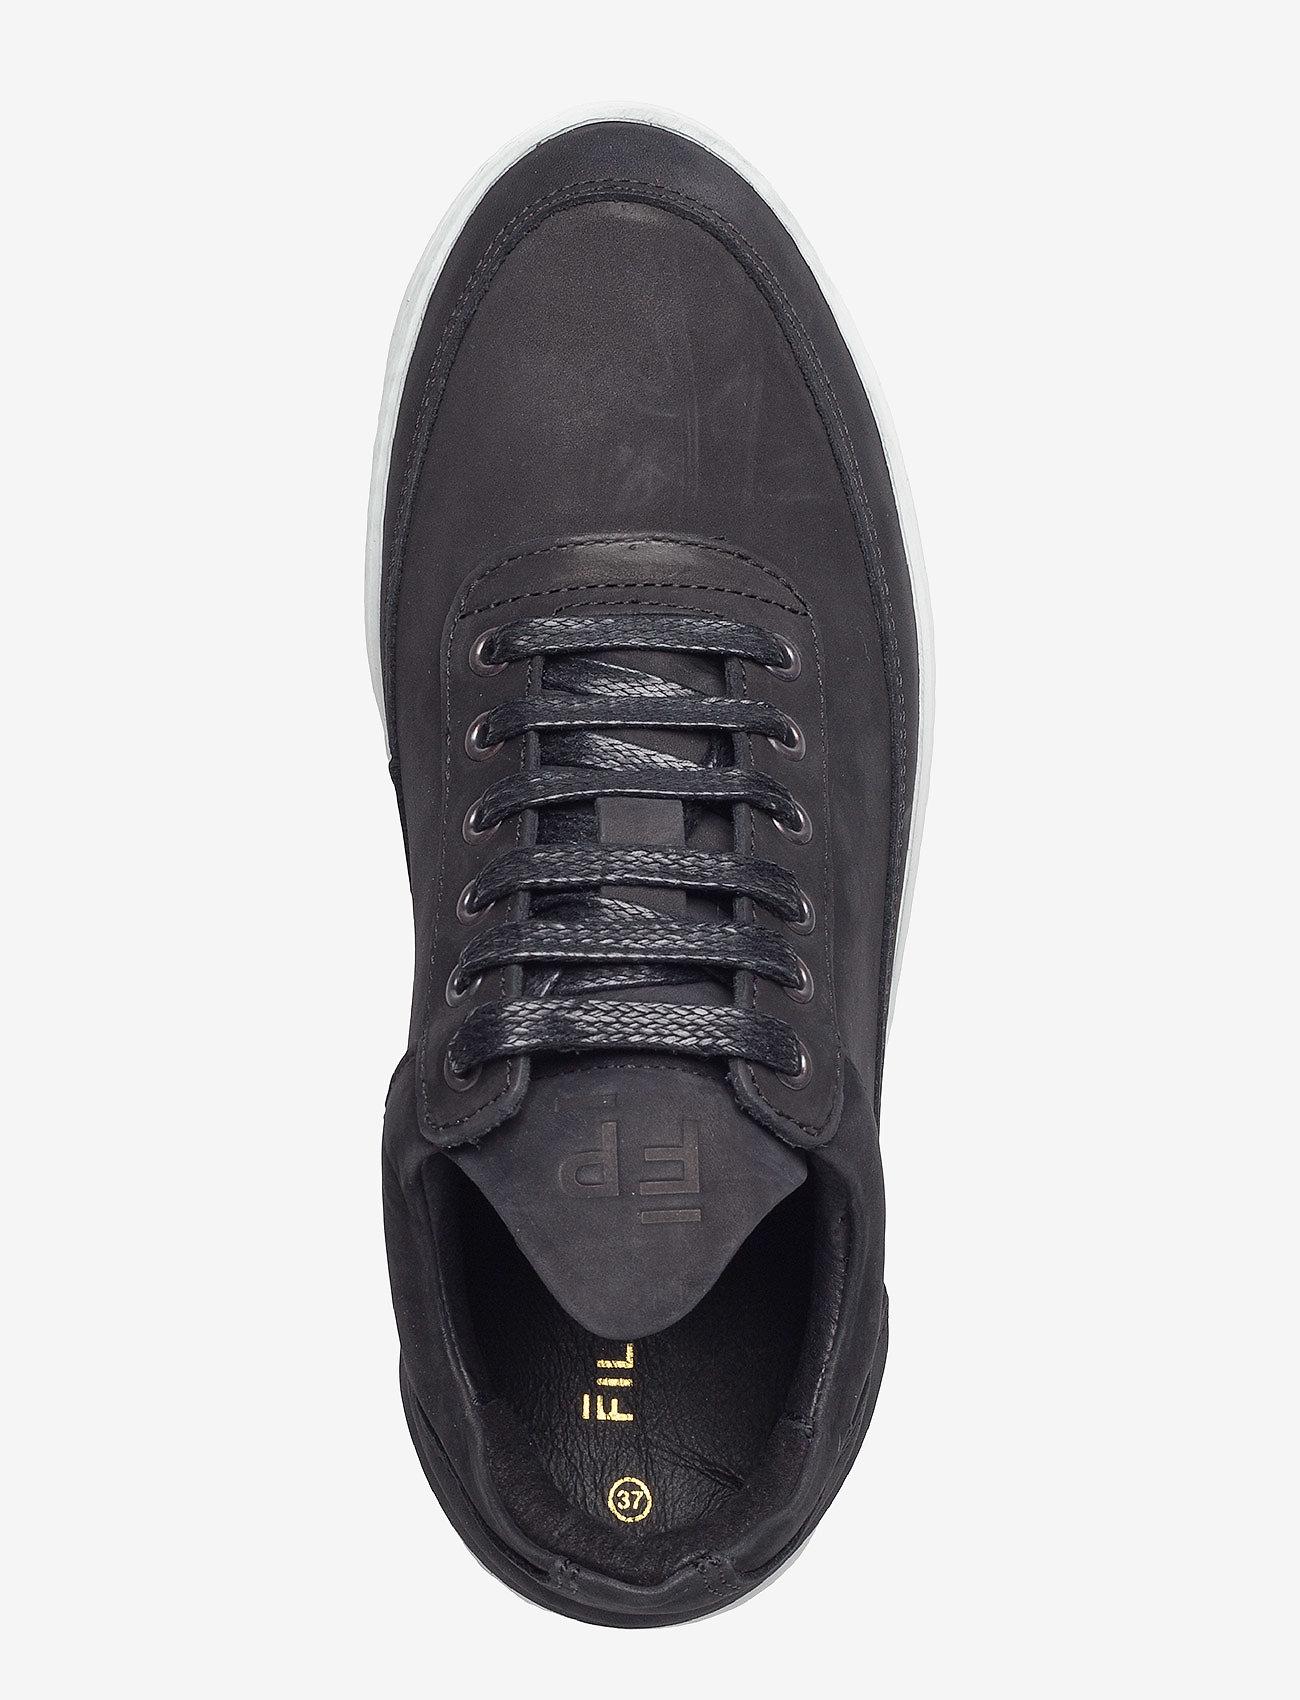 Filling Pieces - Low Top Ripple Basic Black / White - låga sneakers - black/white - 3